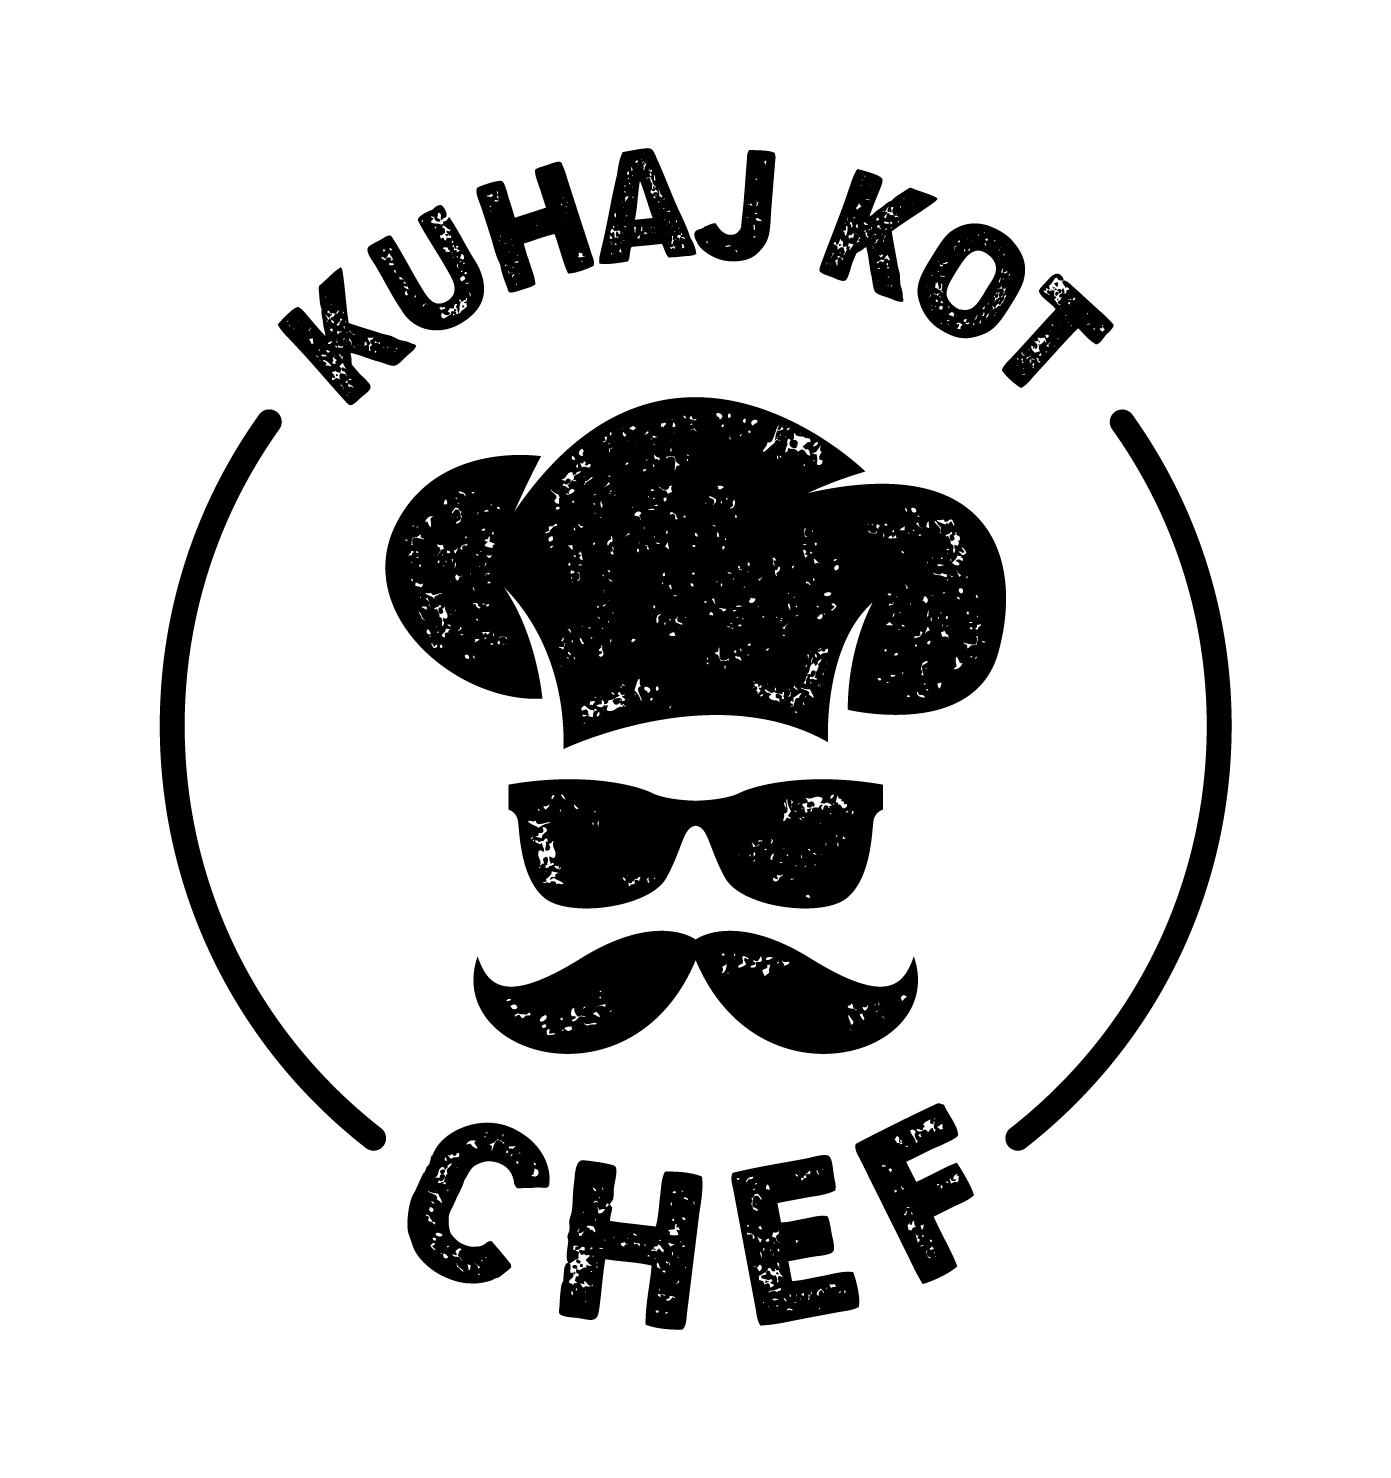 Kuhaj kot chef